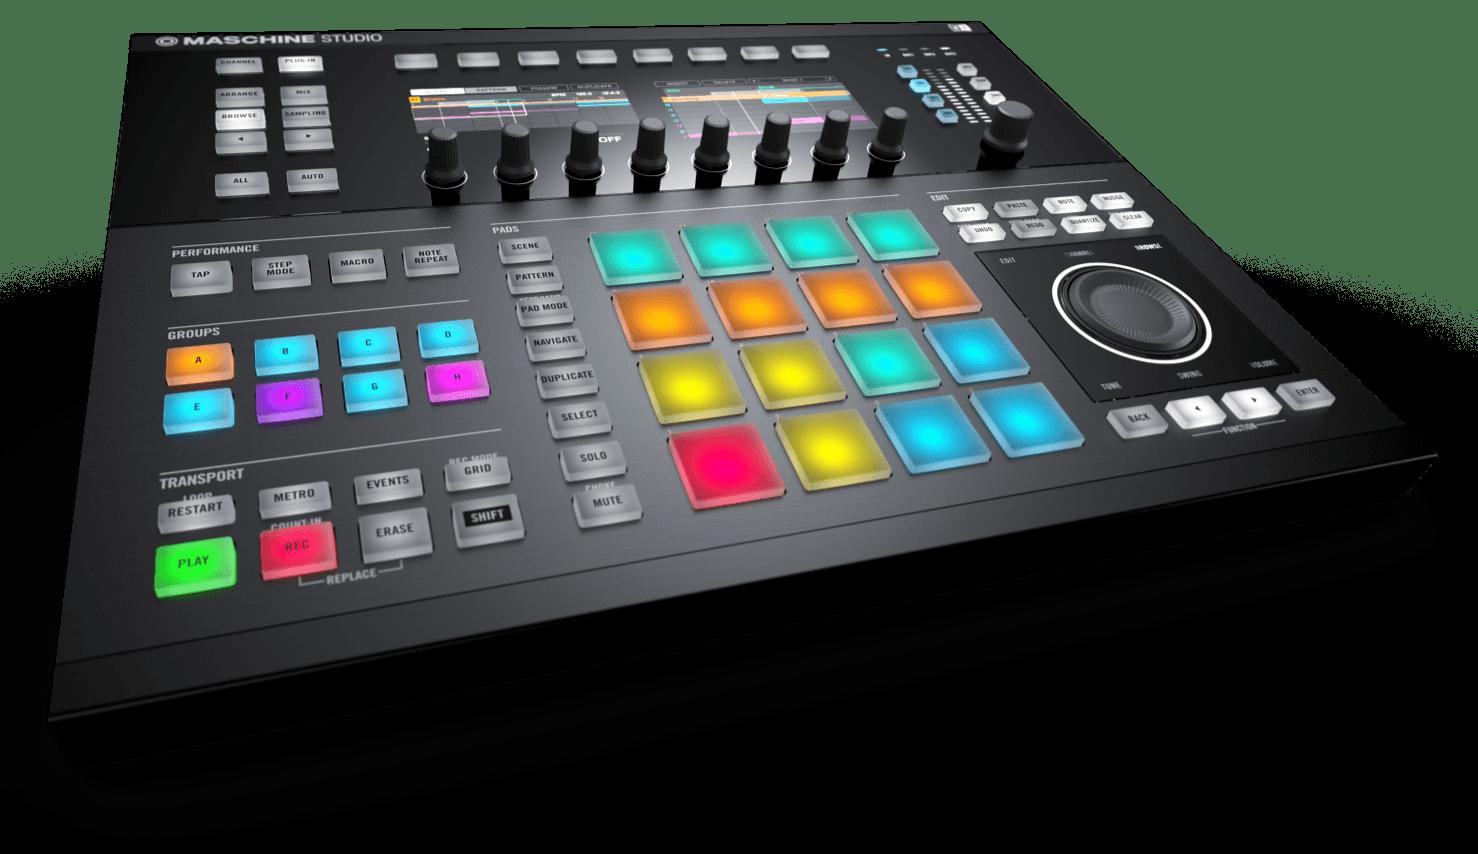 Mashine Studio, Maschine 2.0 Now Available - Synthtopia